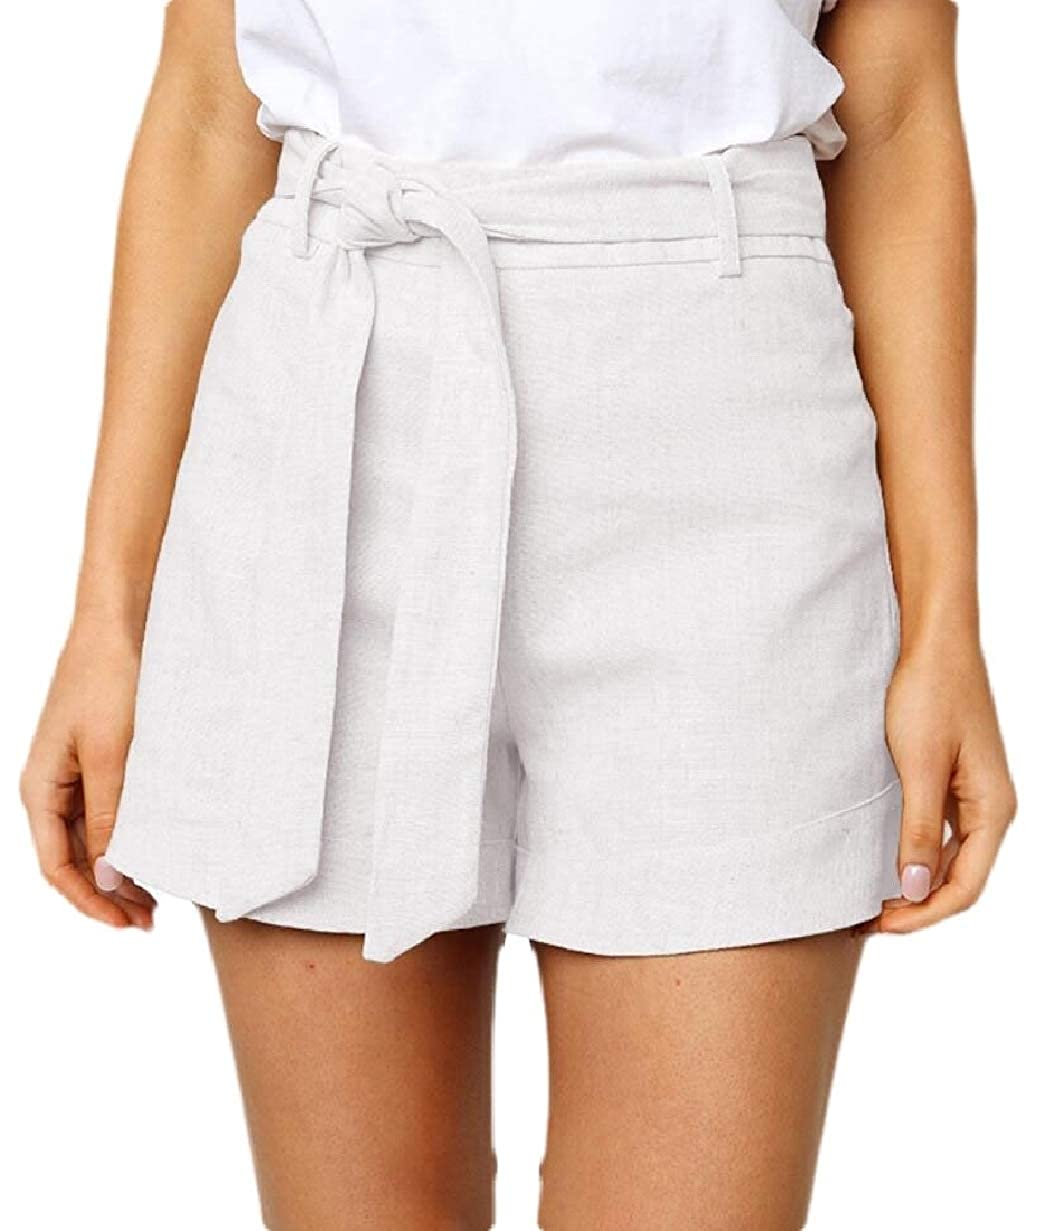 CBTLVSN Women Elastic Waist Casual Solid Color Loose Walking Shorts